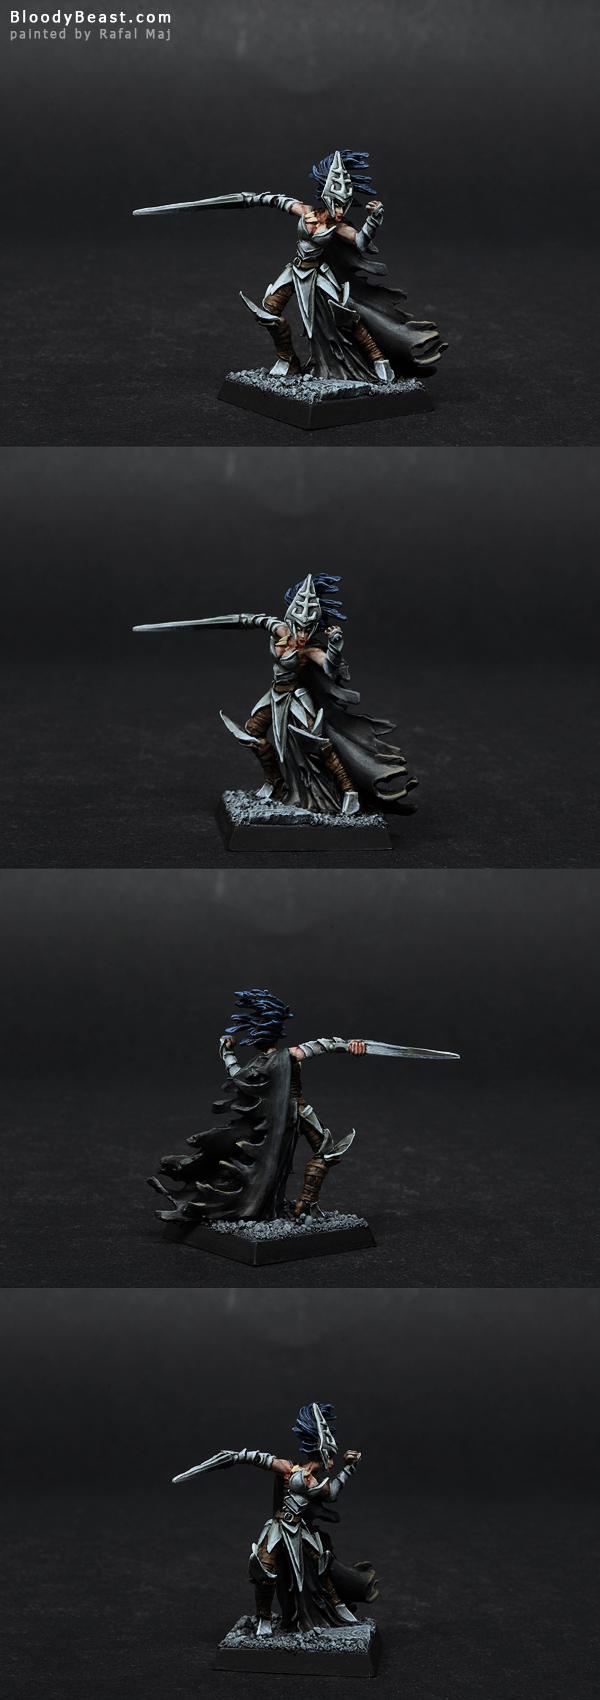 Darkreach Shadowstep Warrior painted by Rafal Maj (BloodyBeast.com)